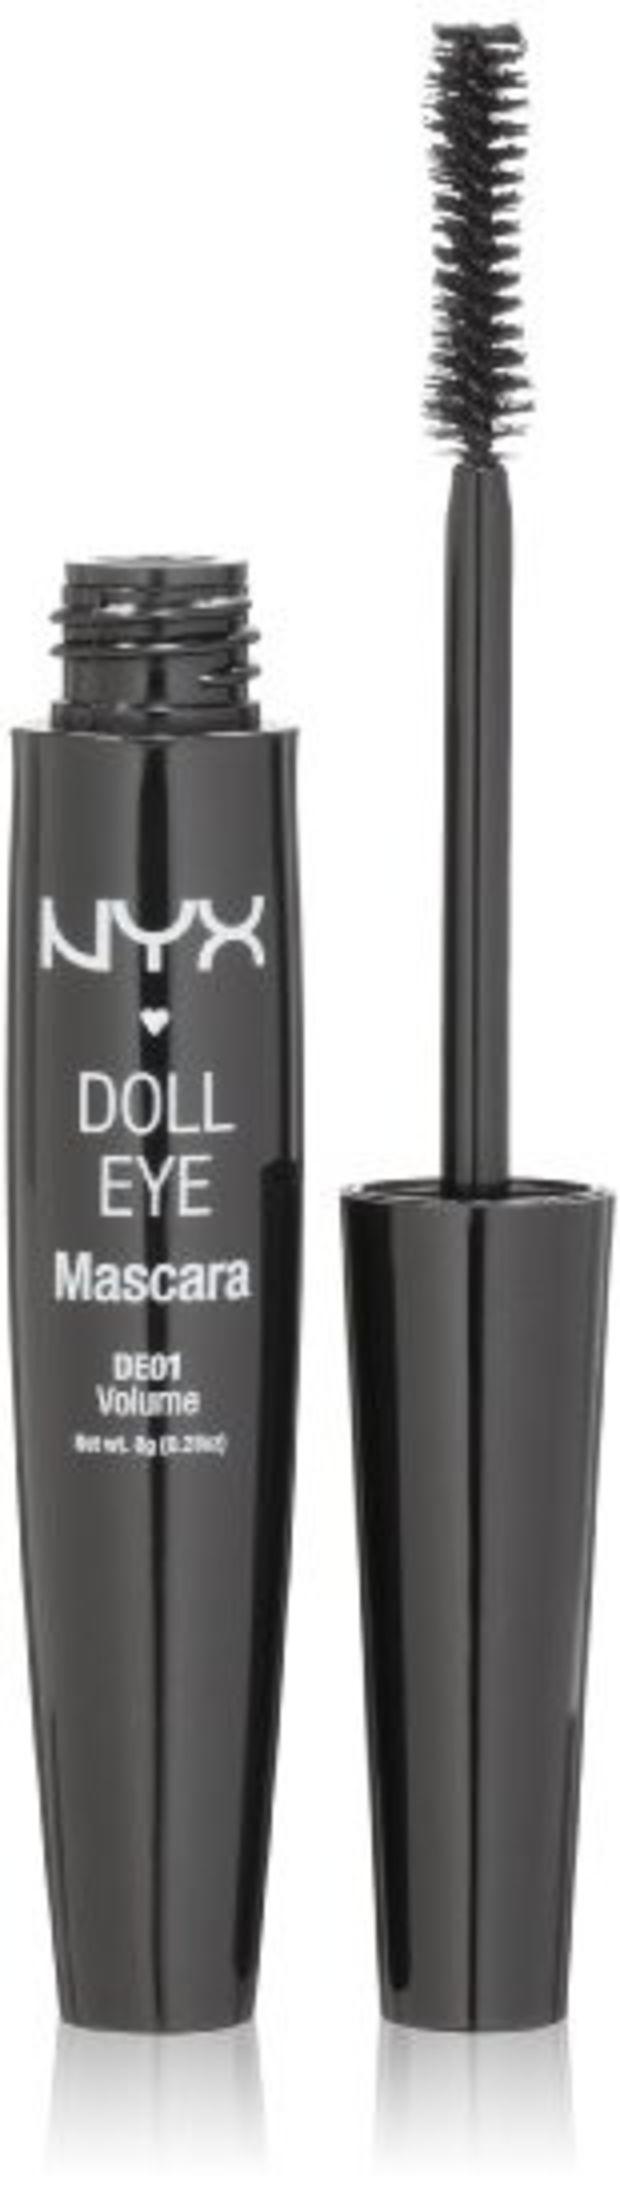 c803b3f07df NYX - Doll Eye Mascara Long Lash - DE01 | Makeup | Nyx doll eye ...